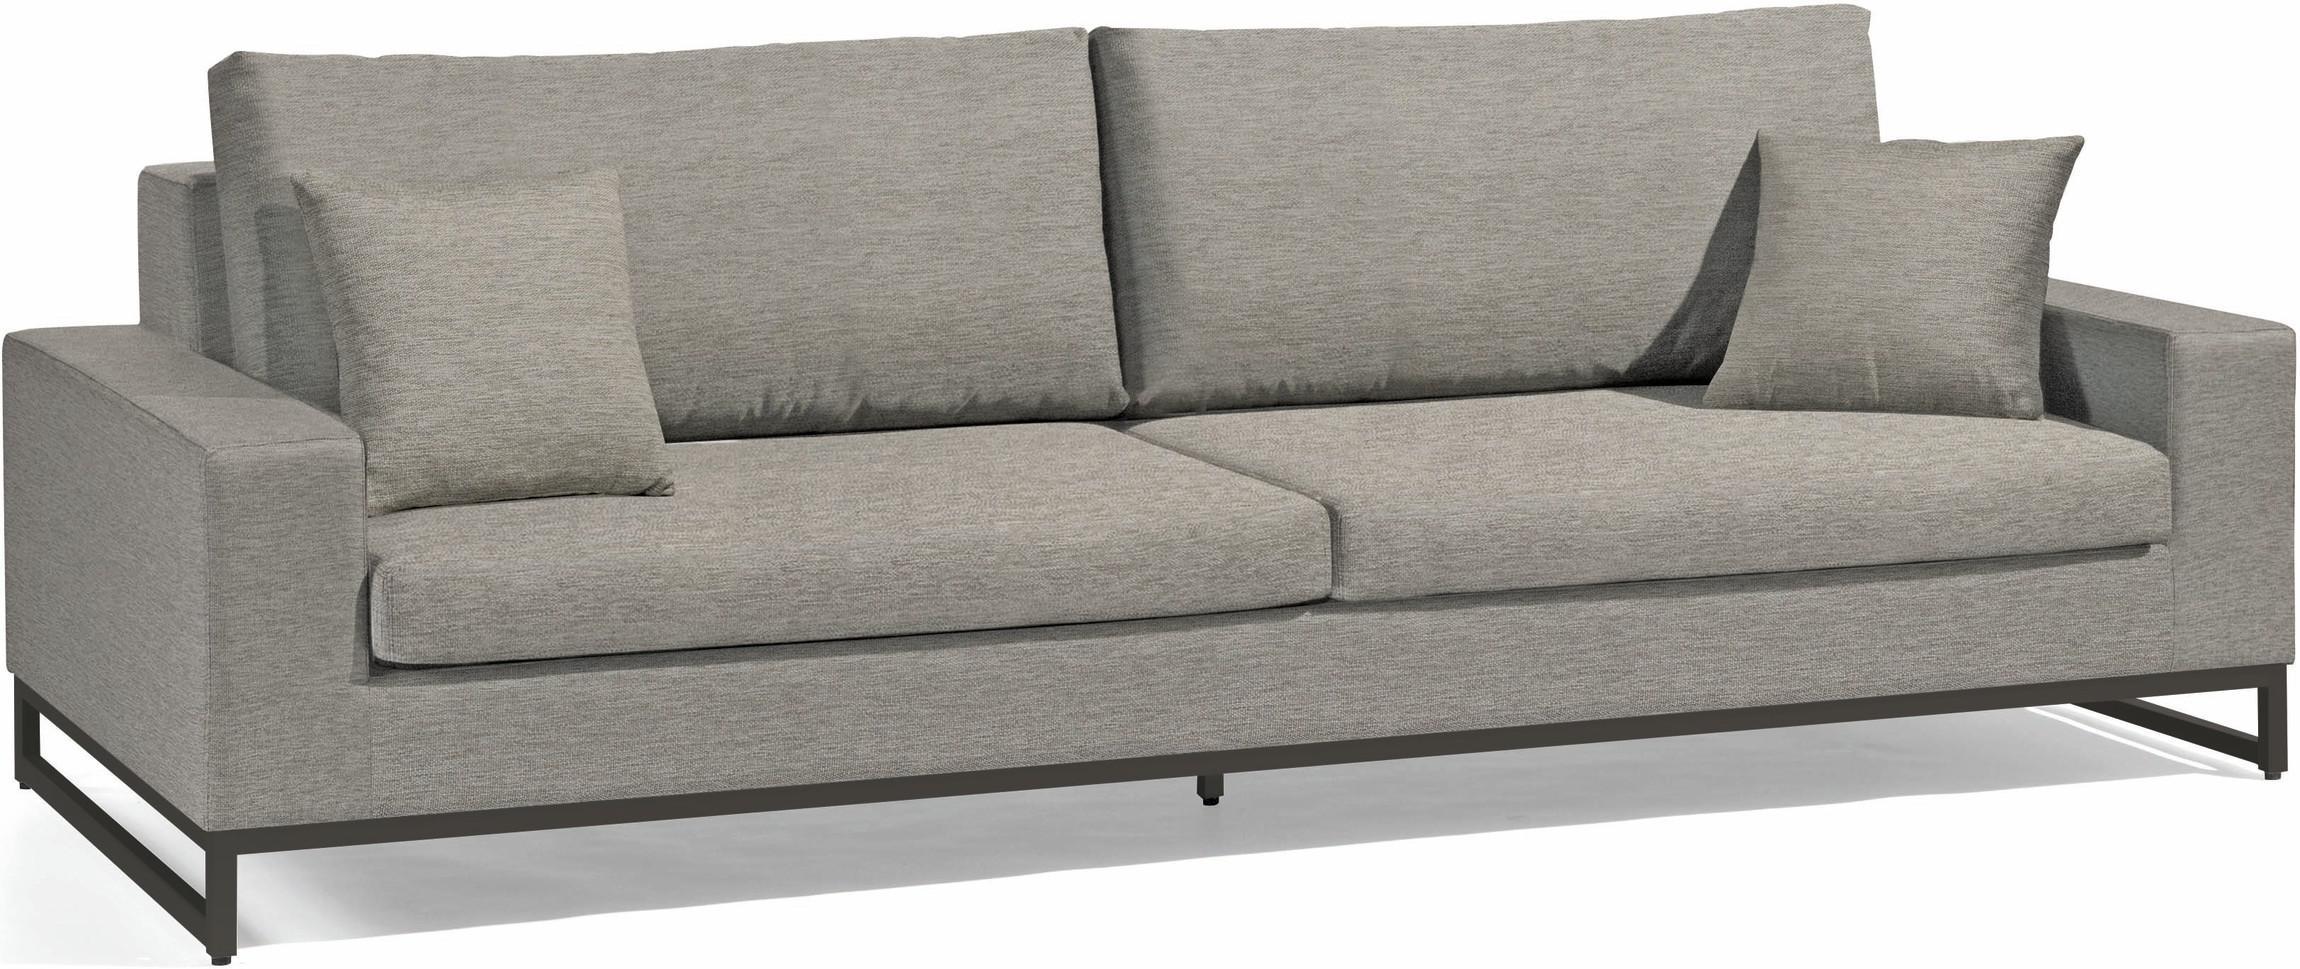 Fantastic Zendo Sofa Fixed Lotus Sparrow 234 Manutti Andrewgaddart Wooden Chair Designs For Living Room Andrewgaddartcom